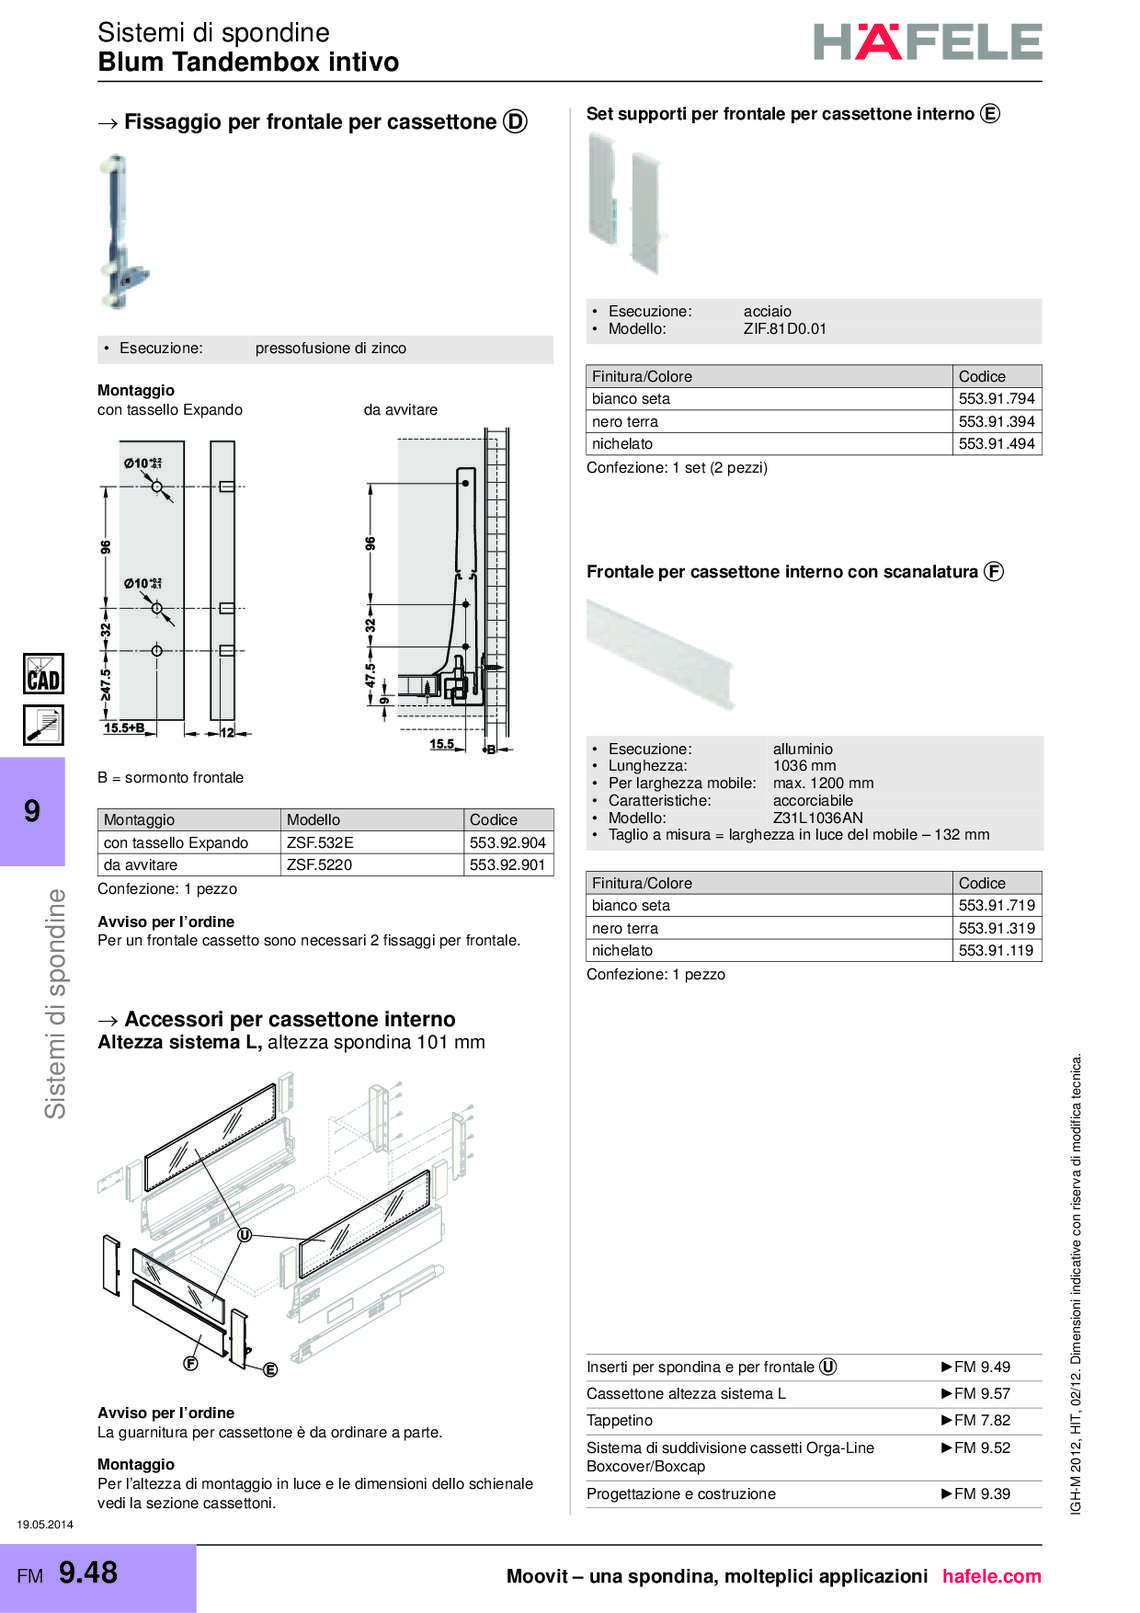 hafele-spondine-e-guide-per-mobili_40_059.jpg